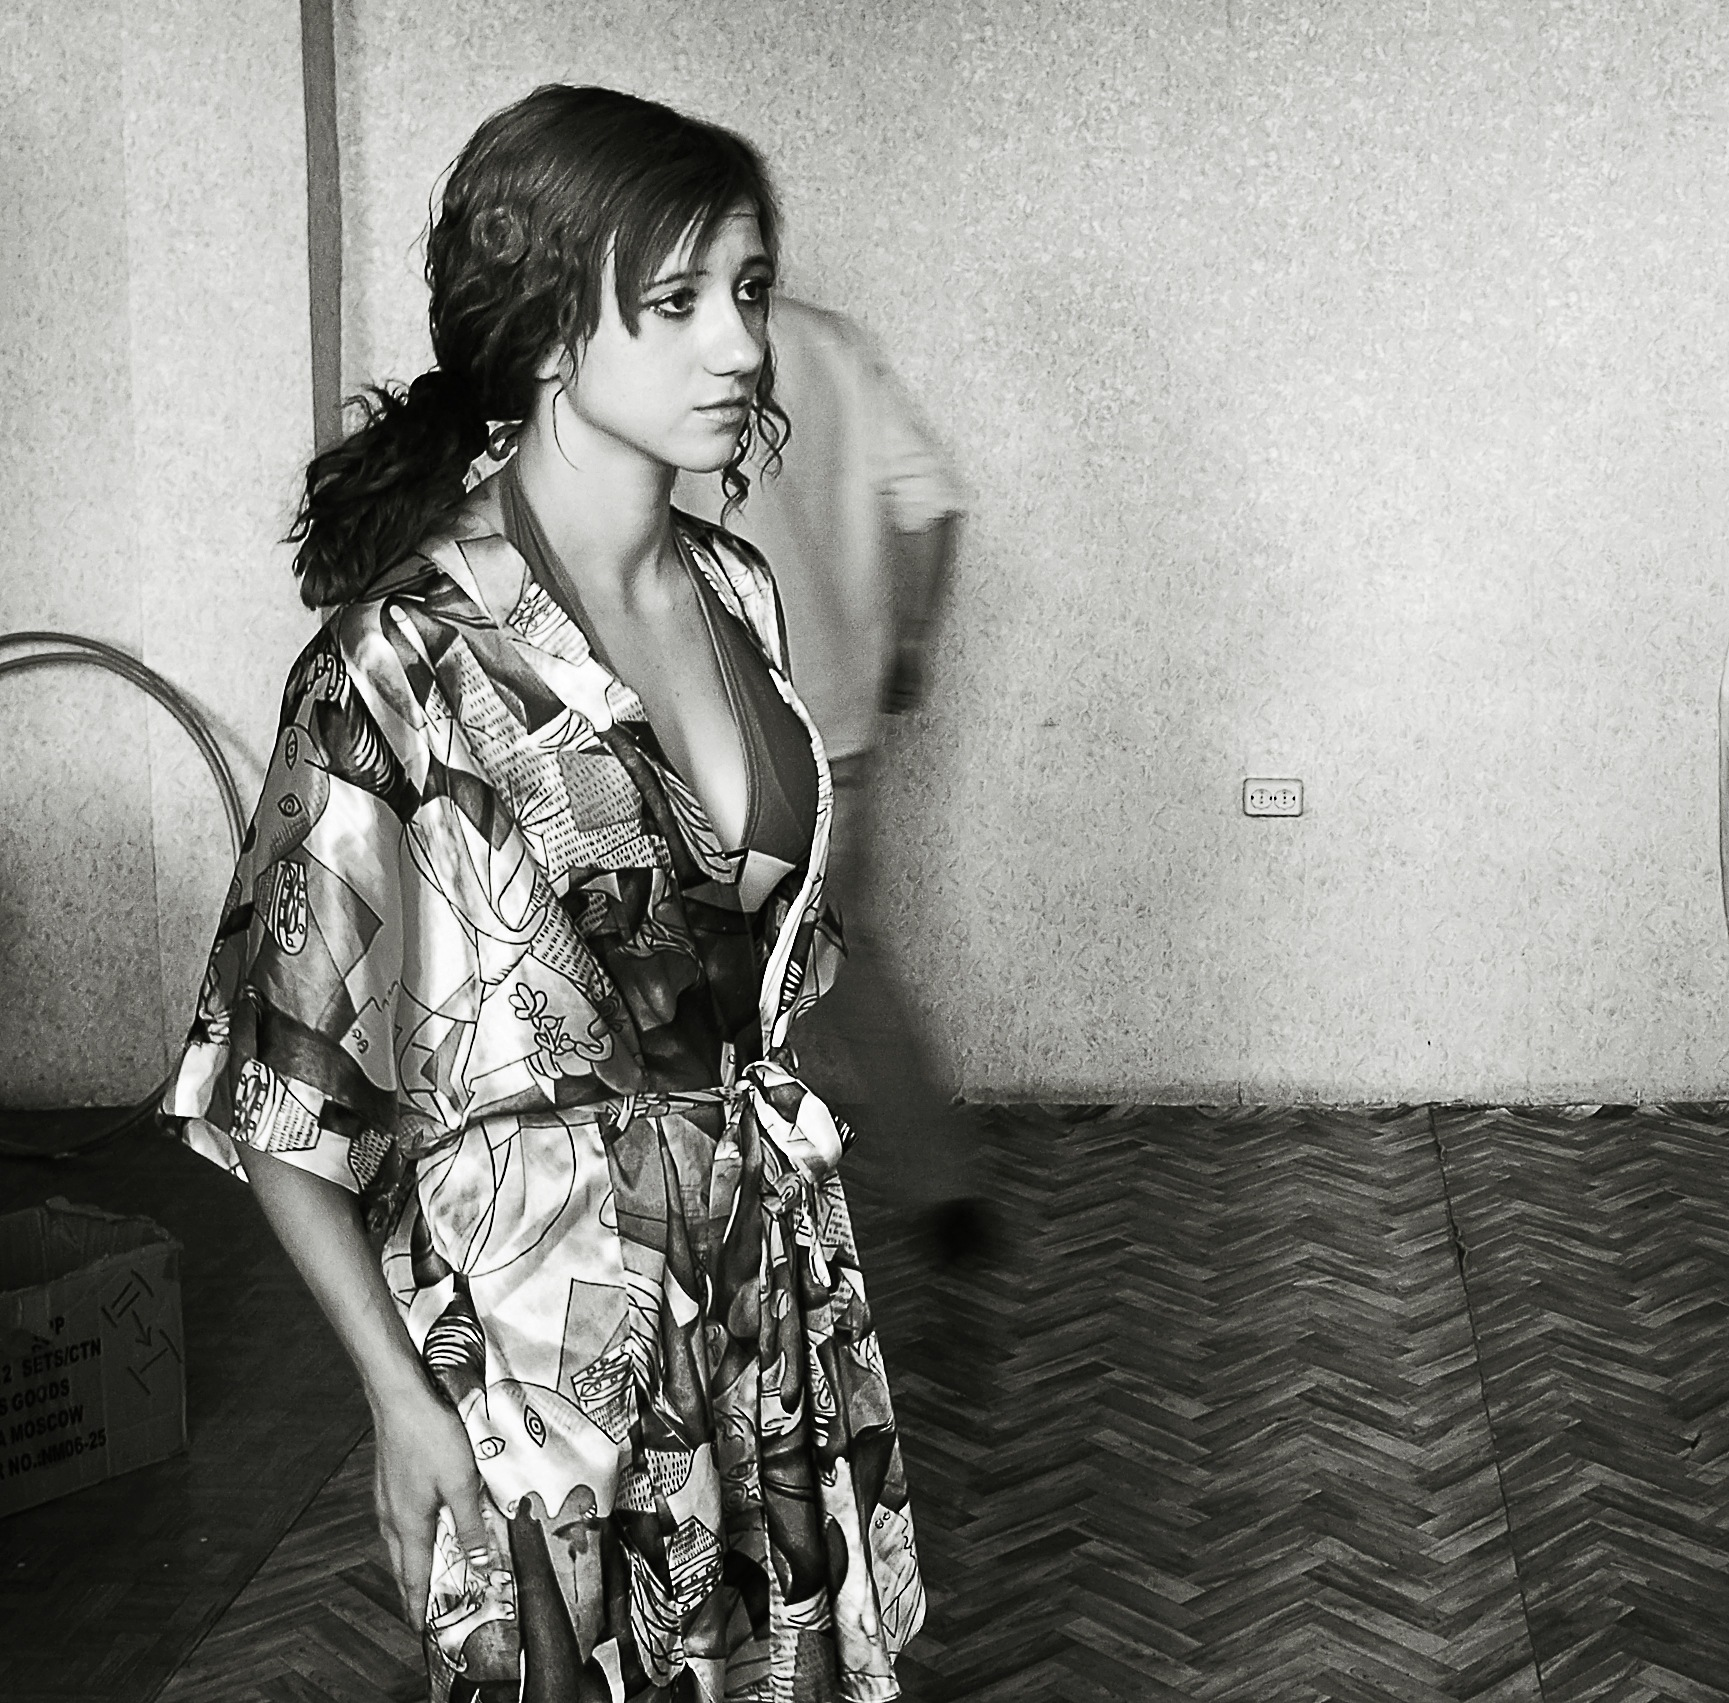 Regina by Сергей Юрьев